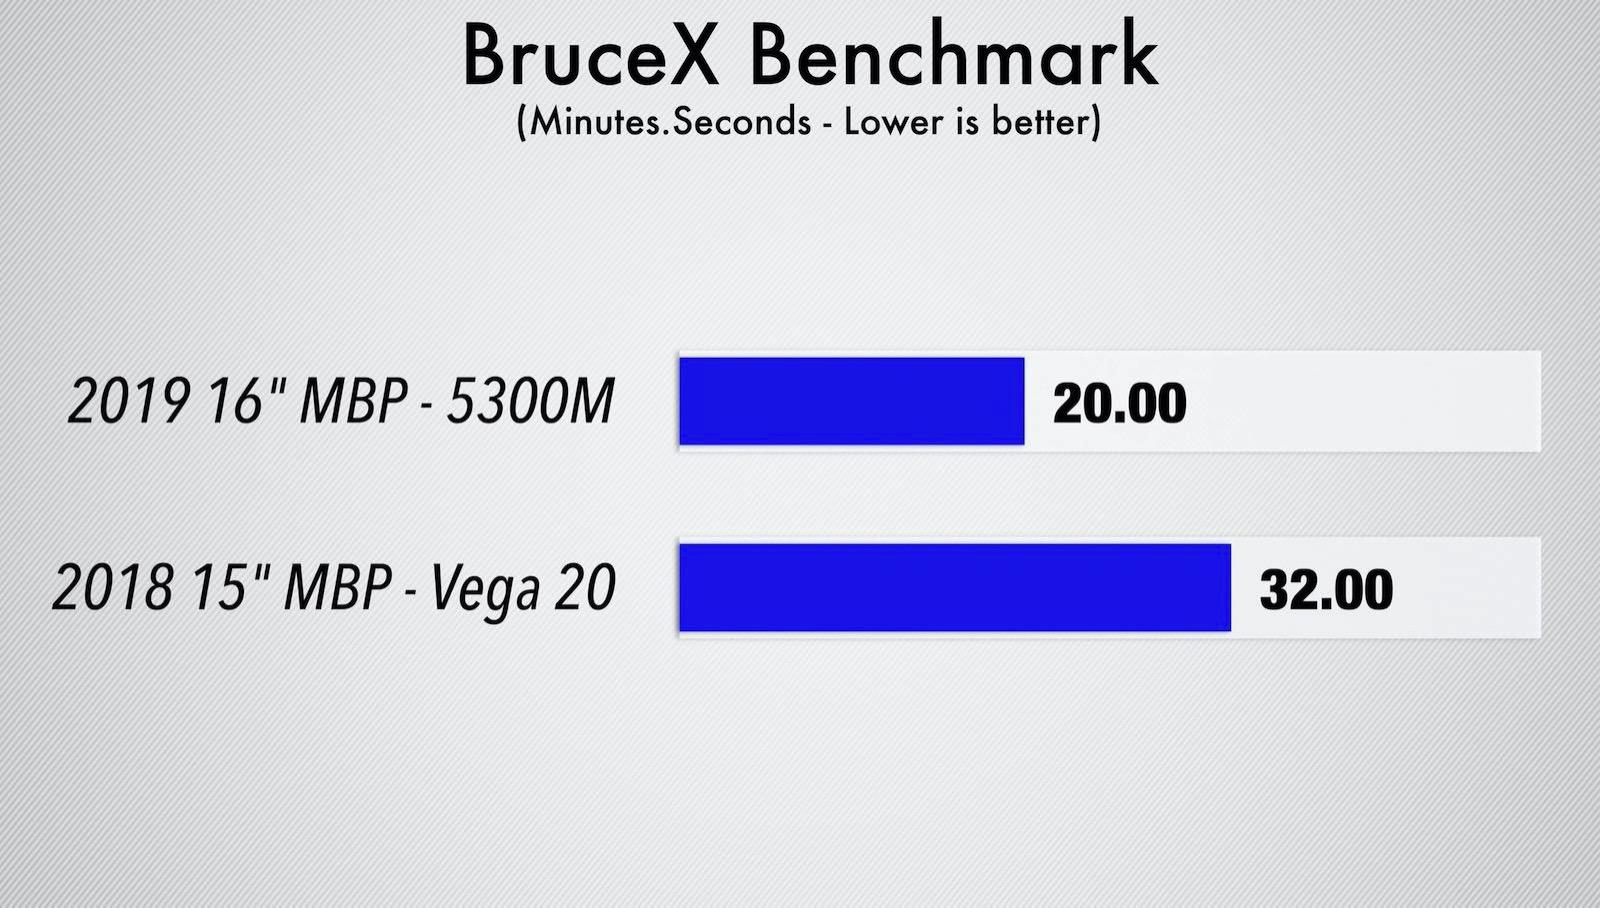 Macbook pro 16 vs 15 brucex